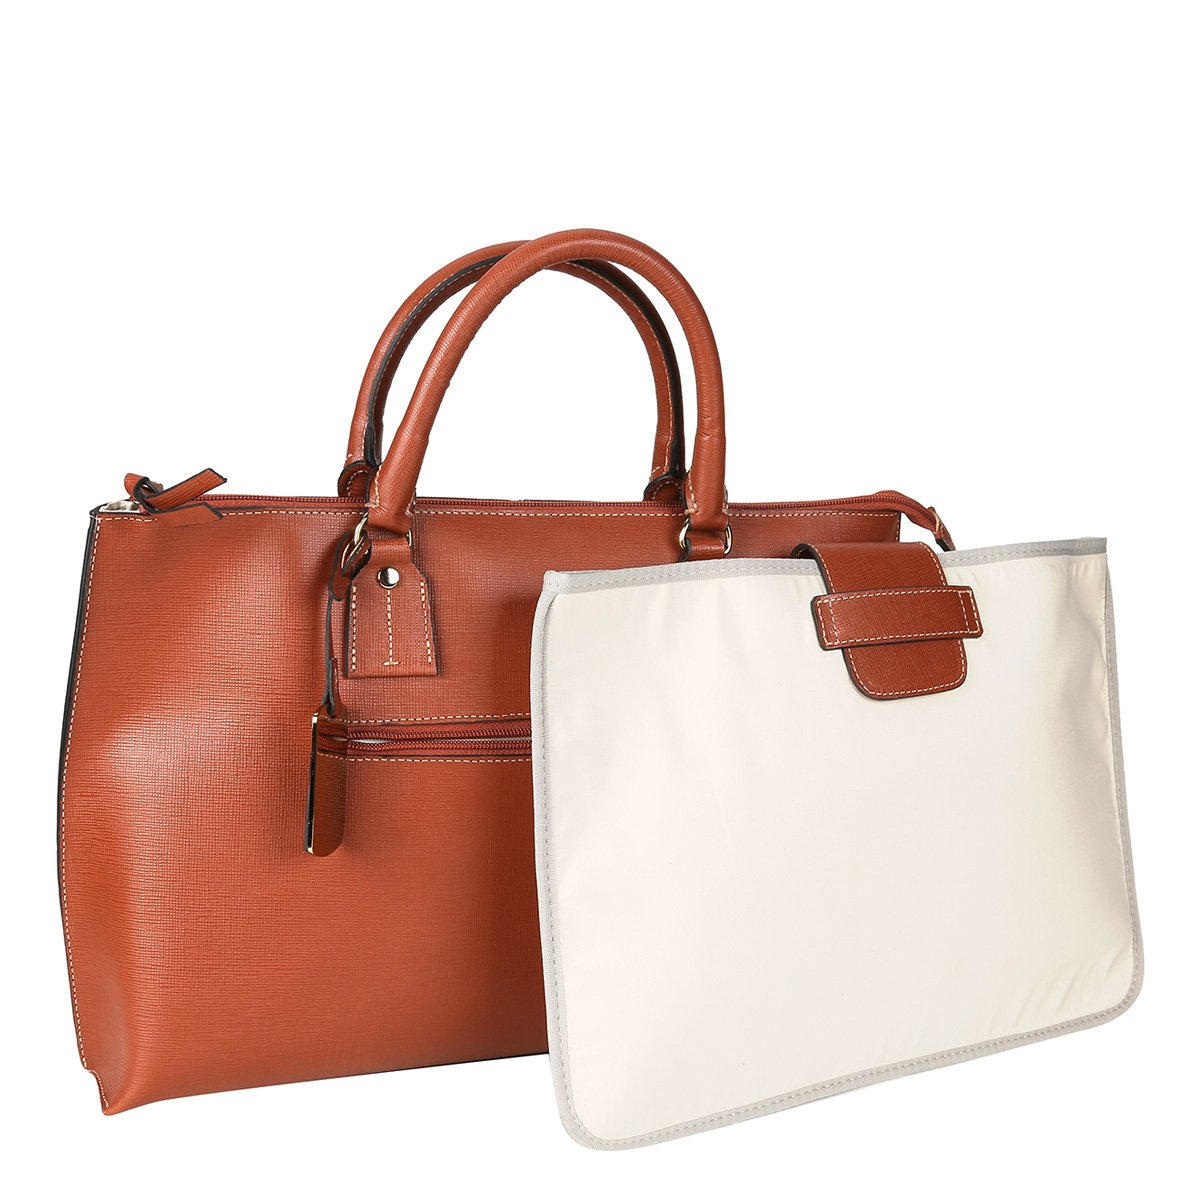 Bolsa Executiva Feminina Couro : Bolsa couro shoestock per executiva feminina caramelo